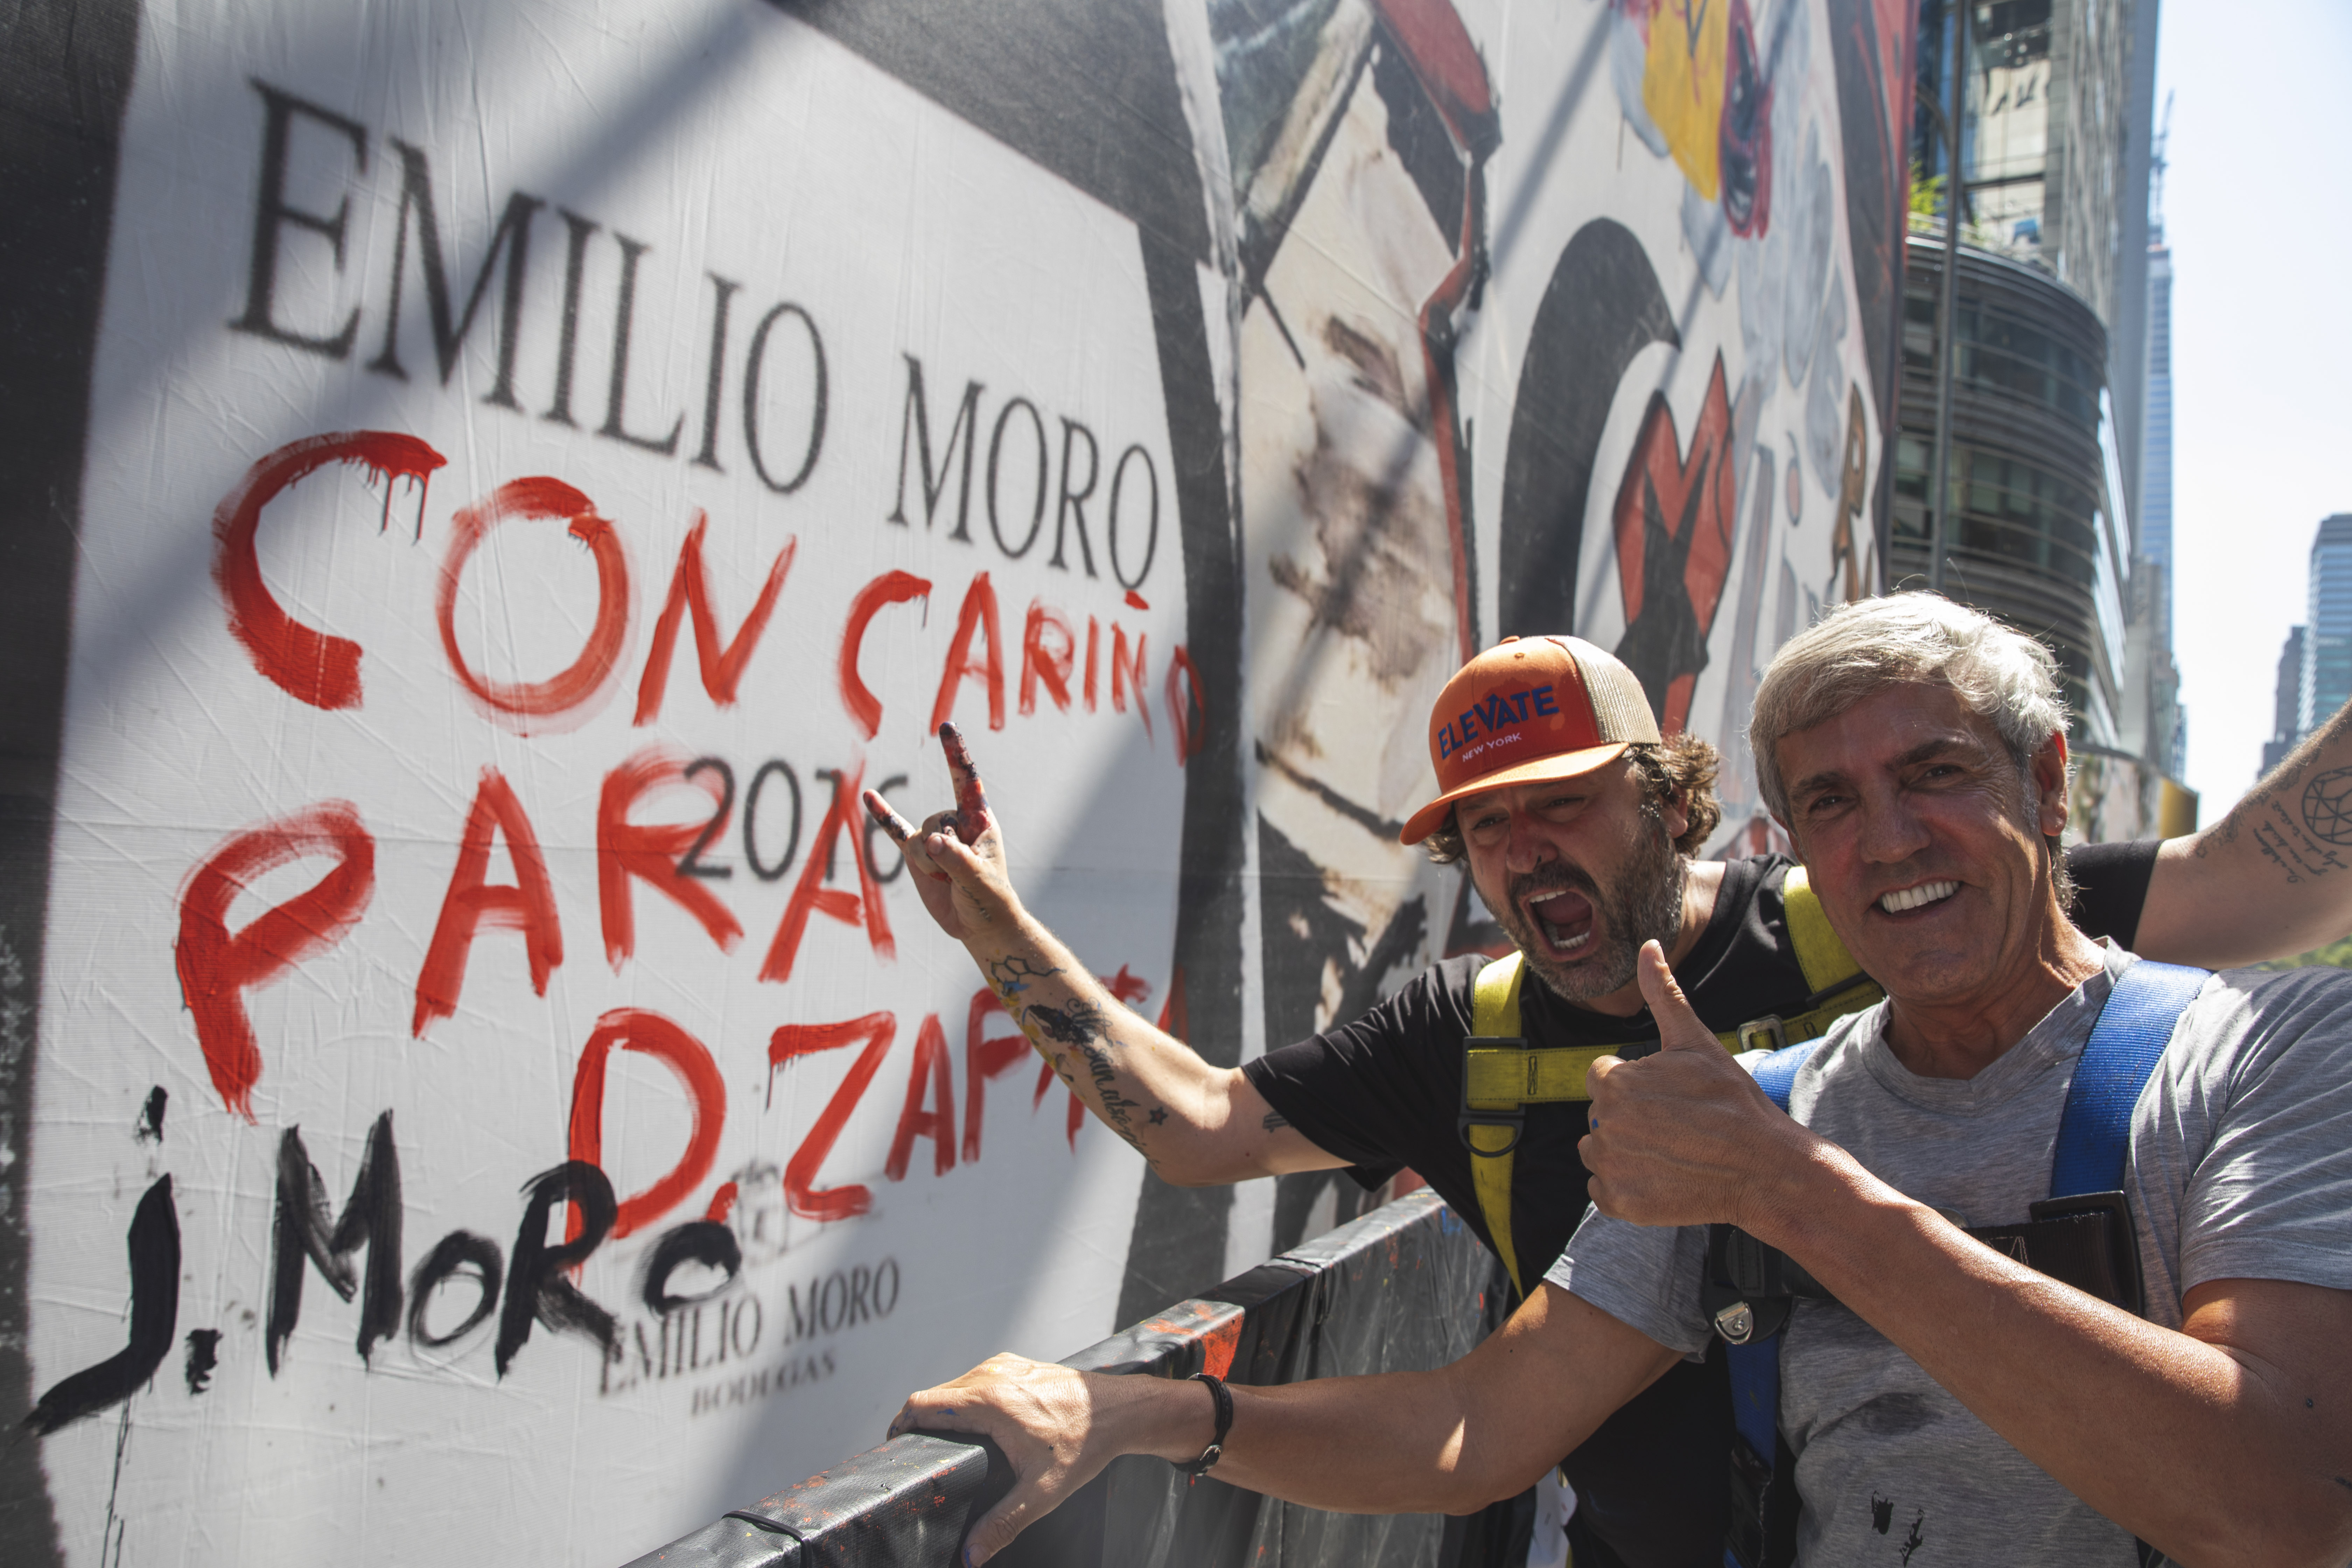 JOSE MORO Y DOMINGO ZAPATA NYC-22